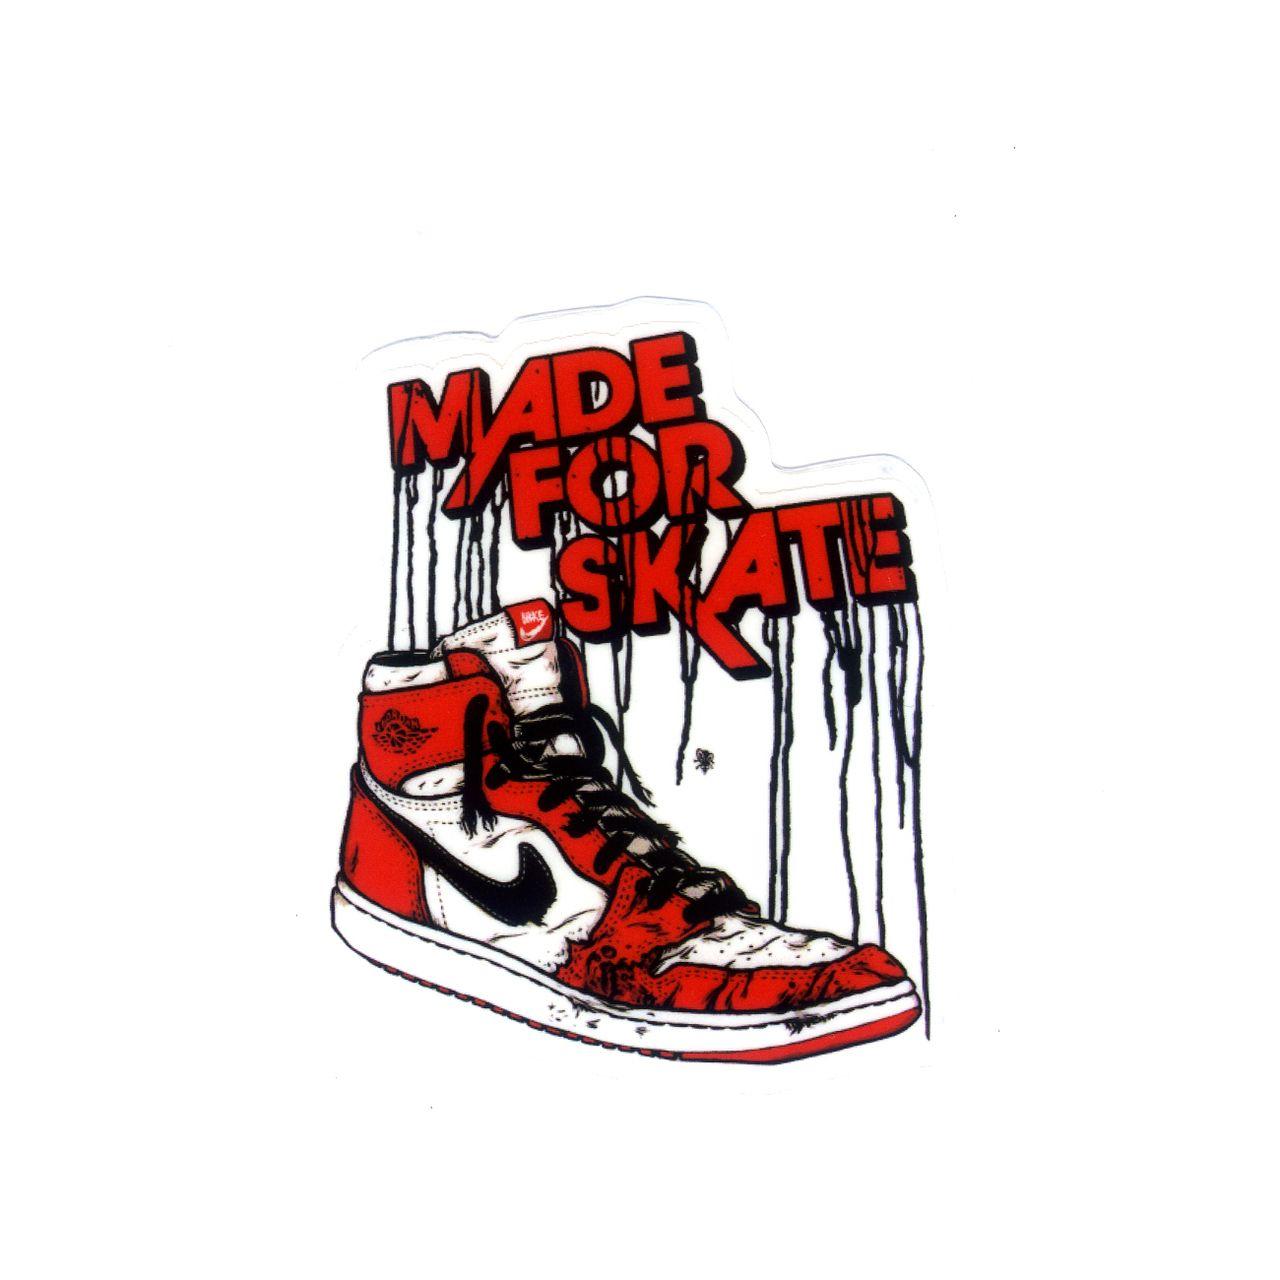 new styles 10fac a9b86 1169 MADE FOR SKATE Air Jordan 1 Sneakers NIKE , 7x6 cm, decal sticker -  DecalStar.com